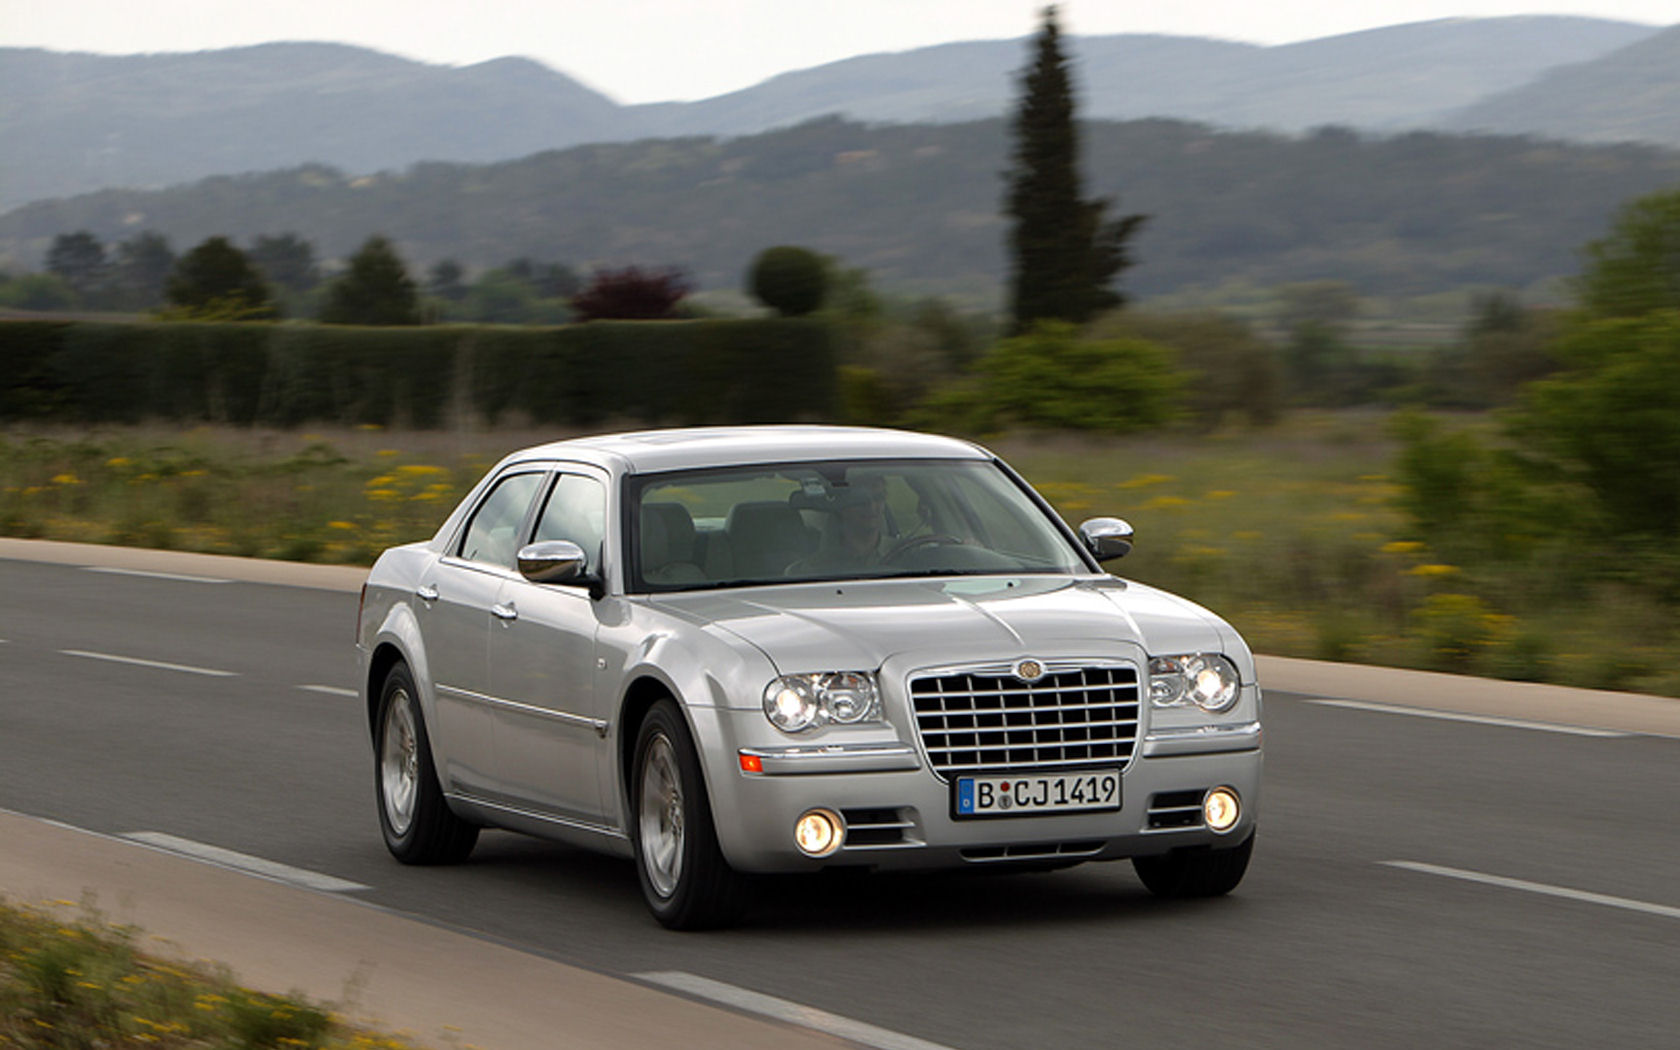 Chrysler 300 Touring Limited 300c Srt8 Free